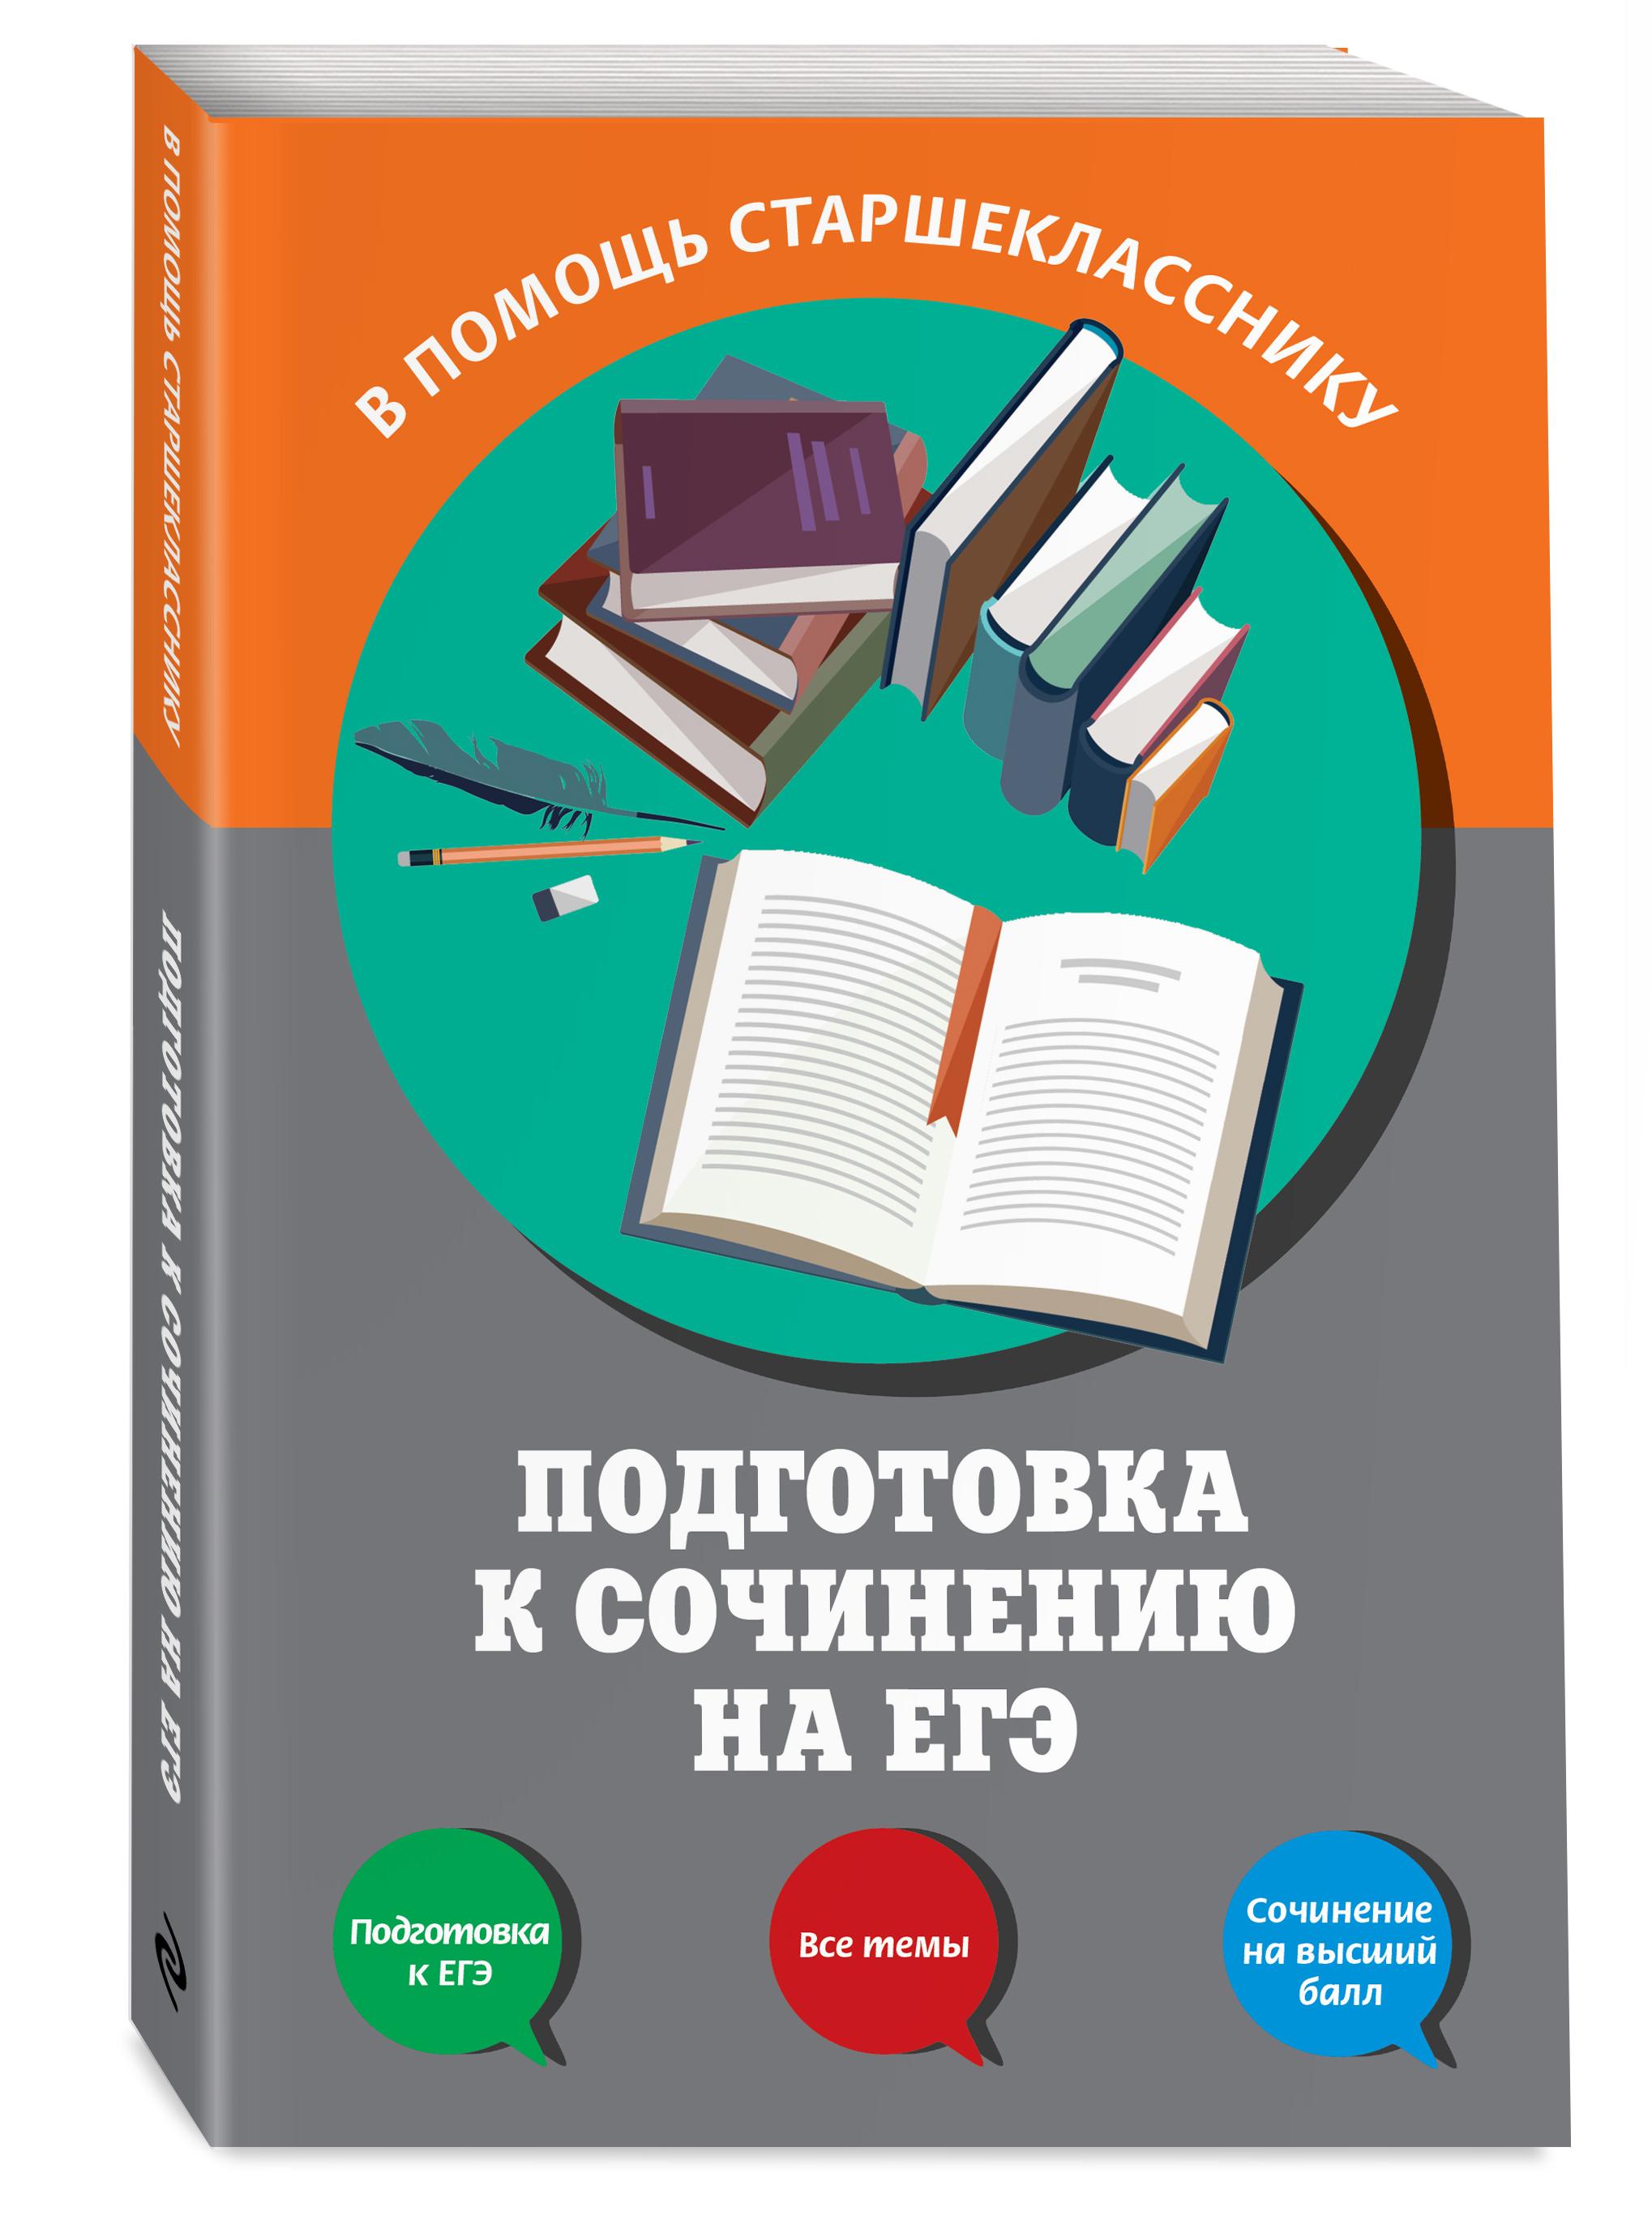 Л. Н. Черкасова, Е. В. Попова Подготовка к сочинению на ЕГЭ